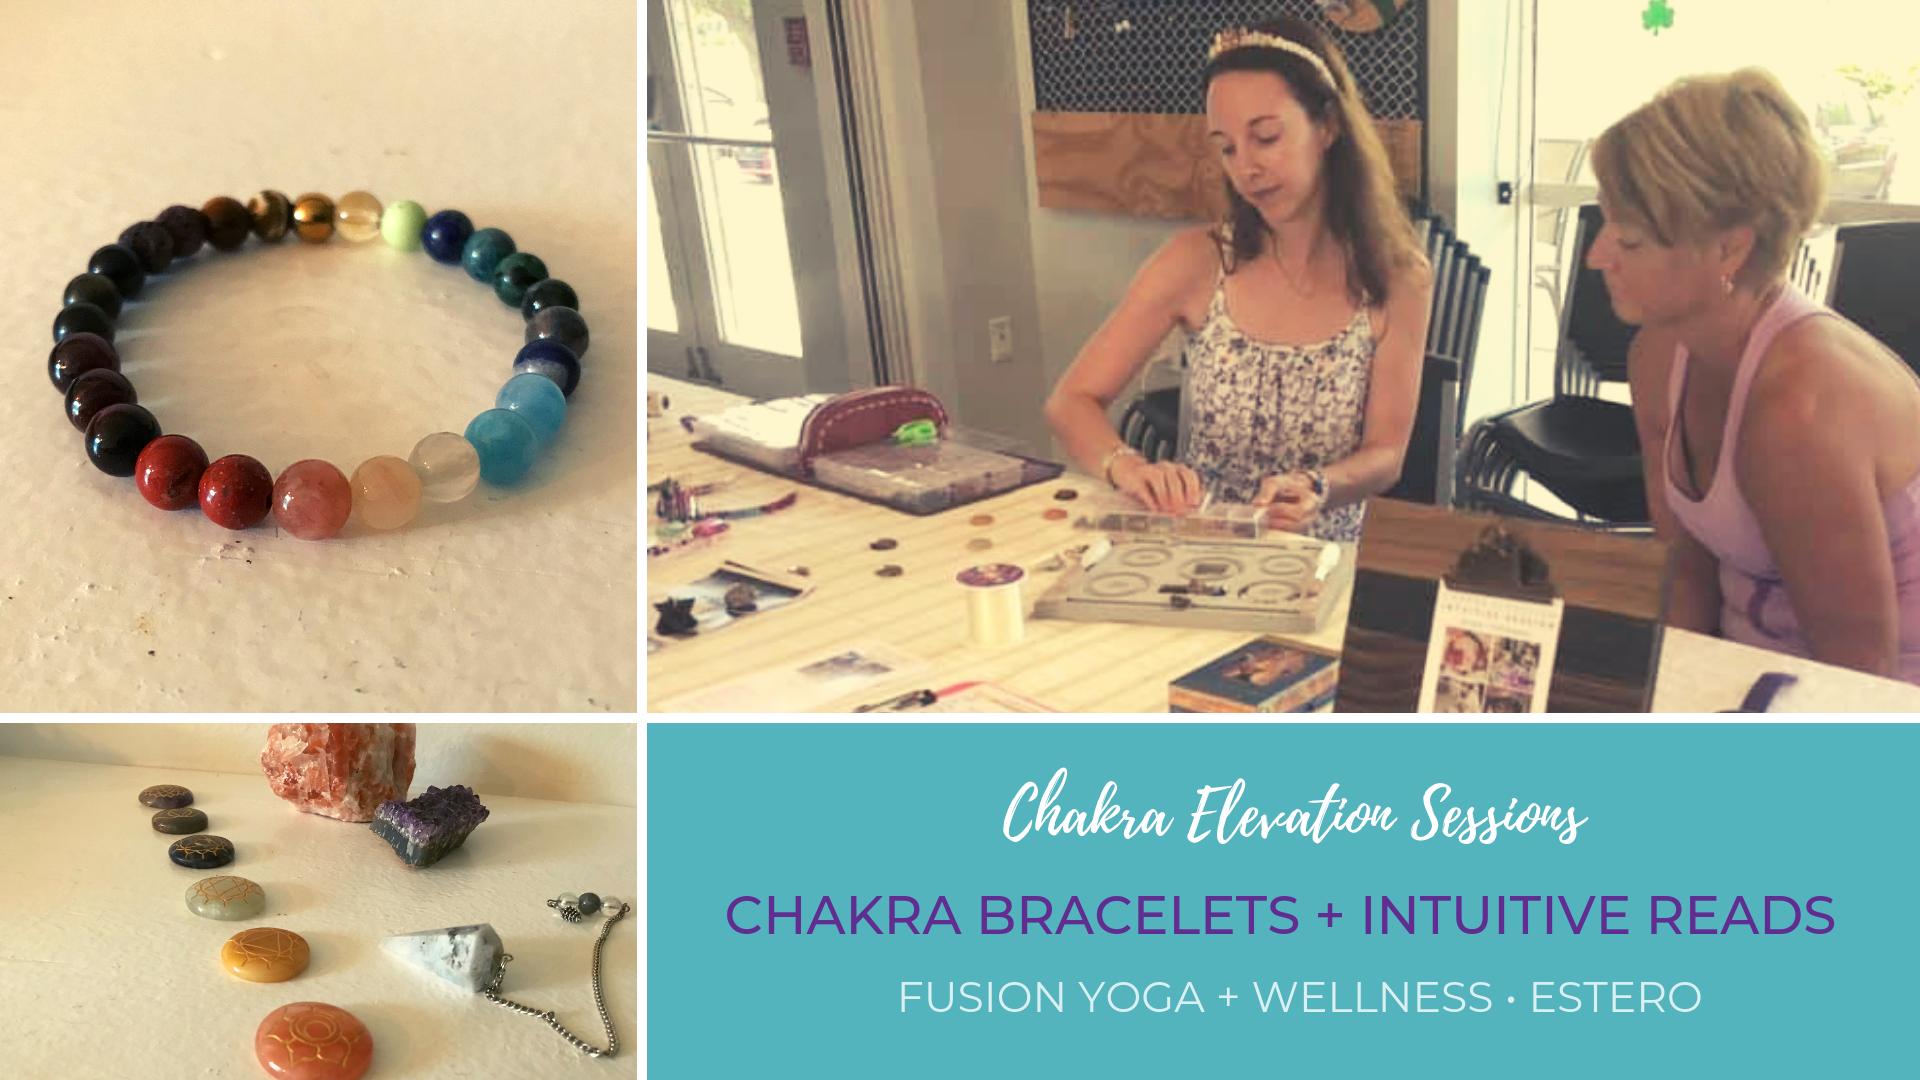 Estero Florida - Chakras Yoga Estero - Psychic Reading Estero - Chakra Jewelry Estero - Bonita Springs Yoga - Fort Myers Psychic.png